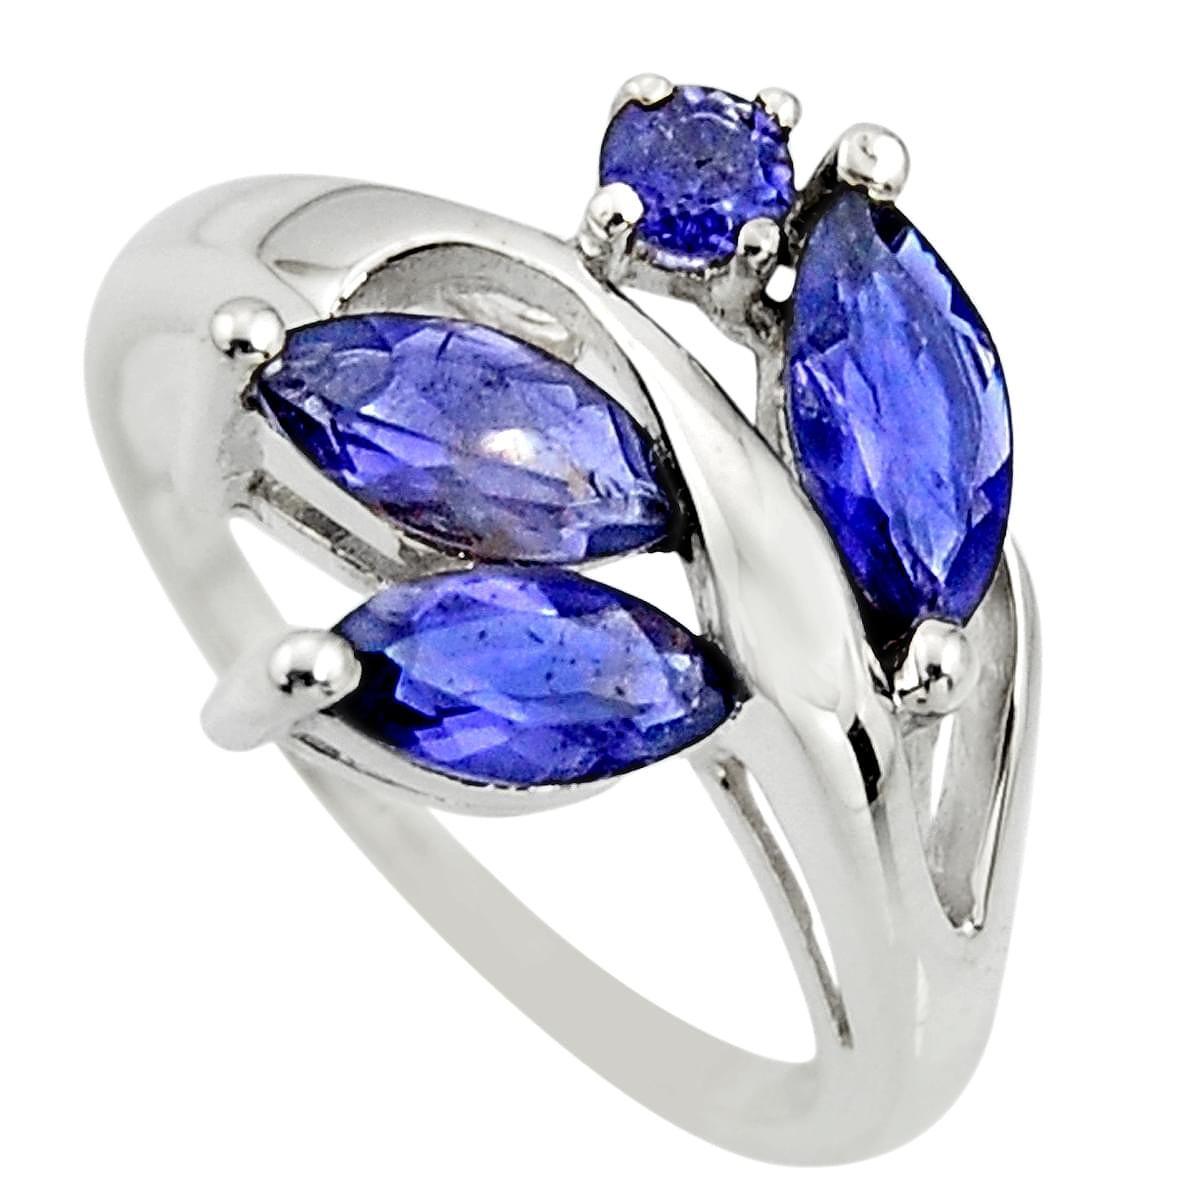 Blue Iolite Nugget Pendant Sterling Silver earthegy #2096